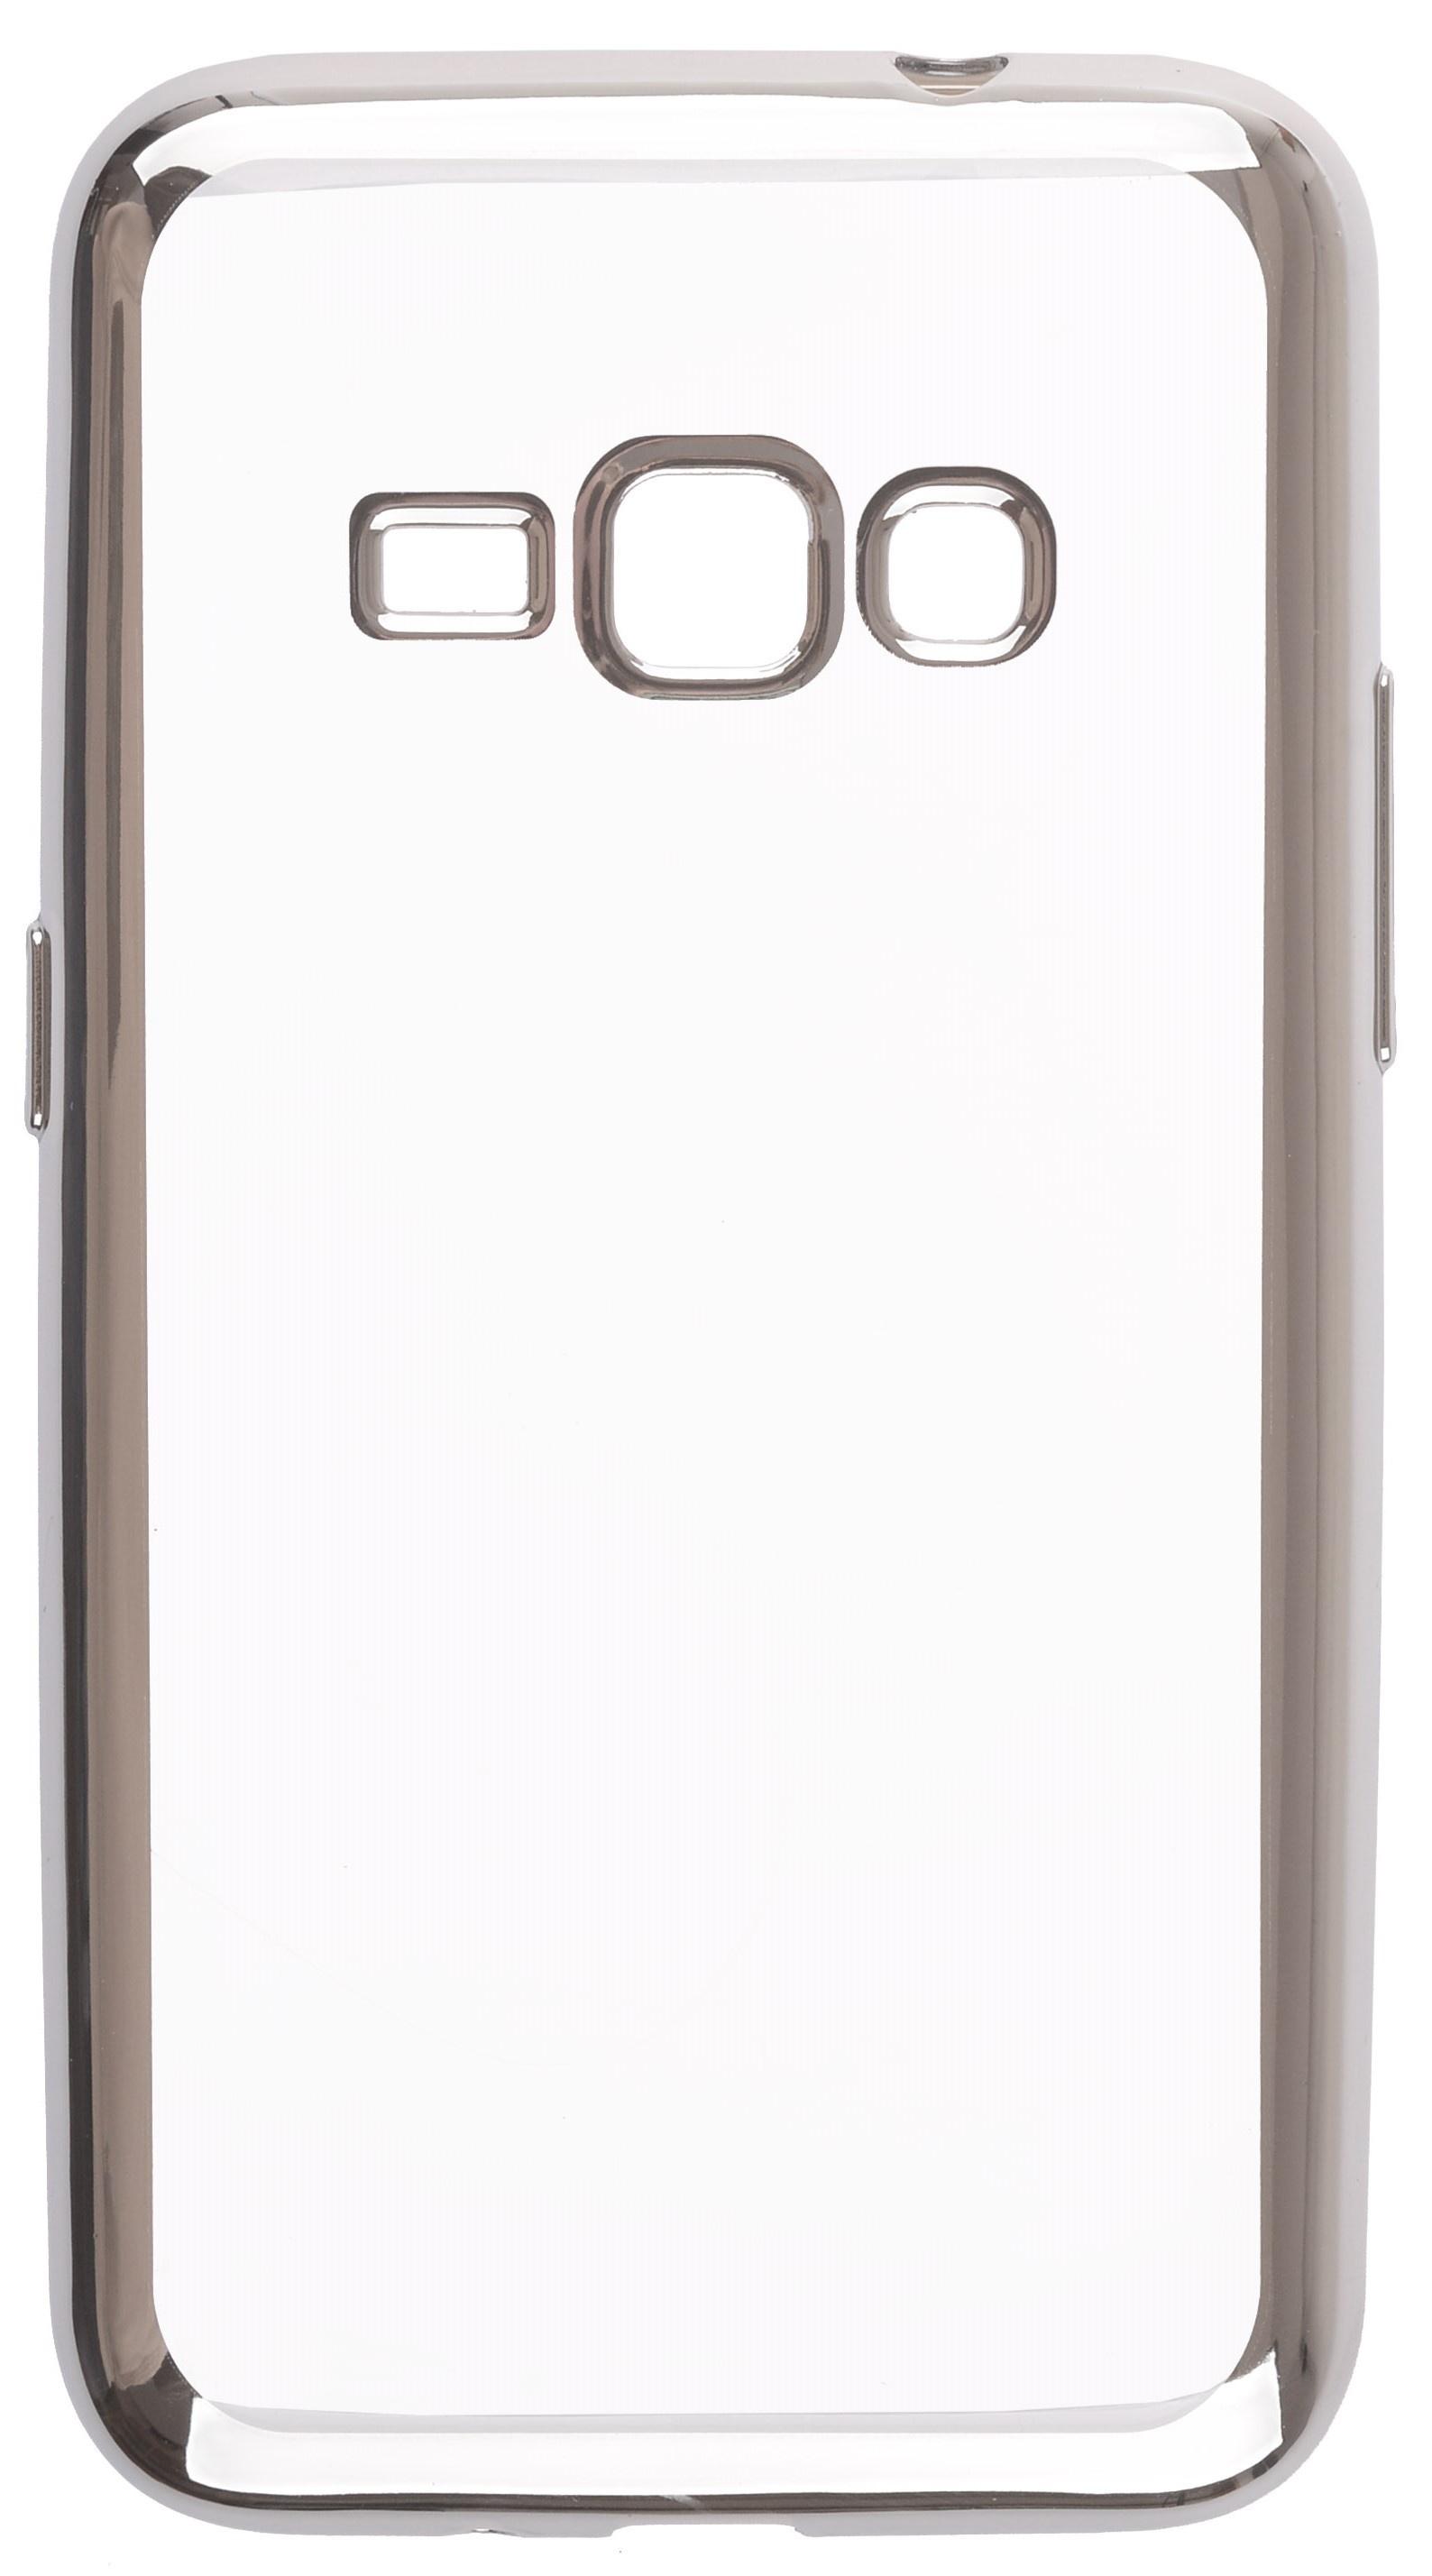 Чехол для сотового телефона skinBOX Silicone chrome border, 4630042524699, серебристый чехол для сотового телефона skinbox silicone chrome border 4630042528697 серебристый